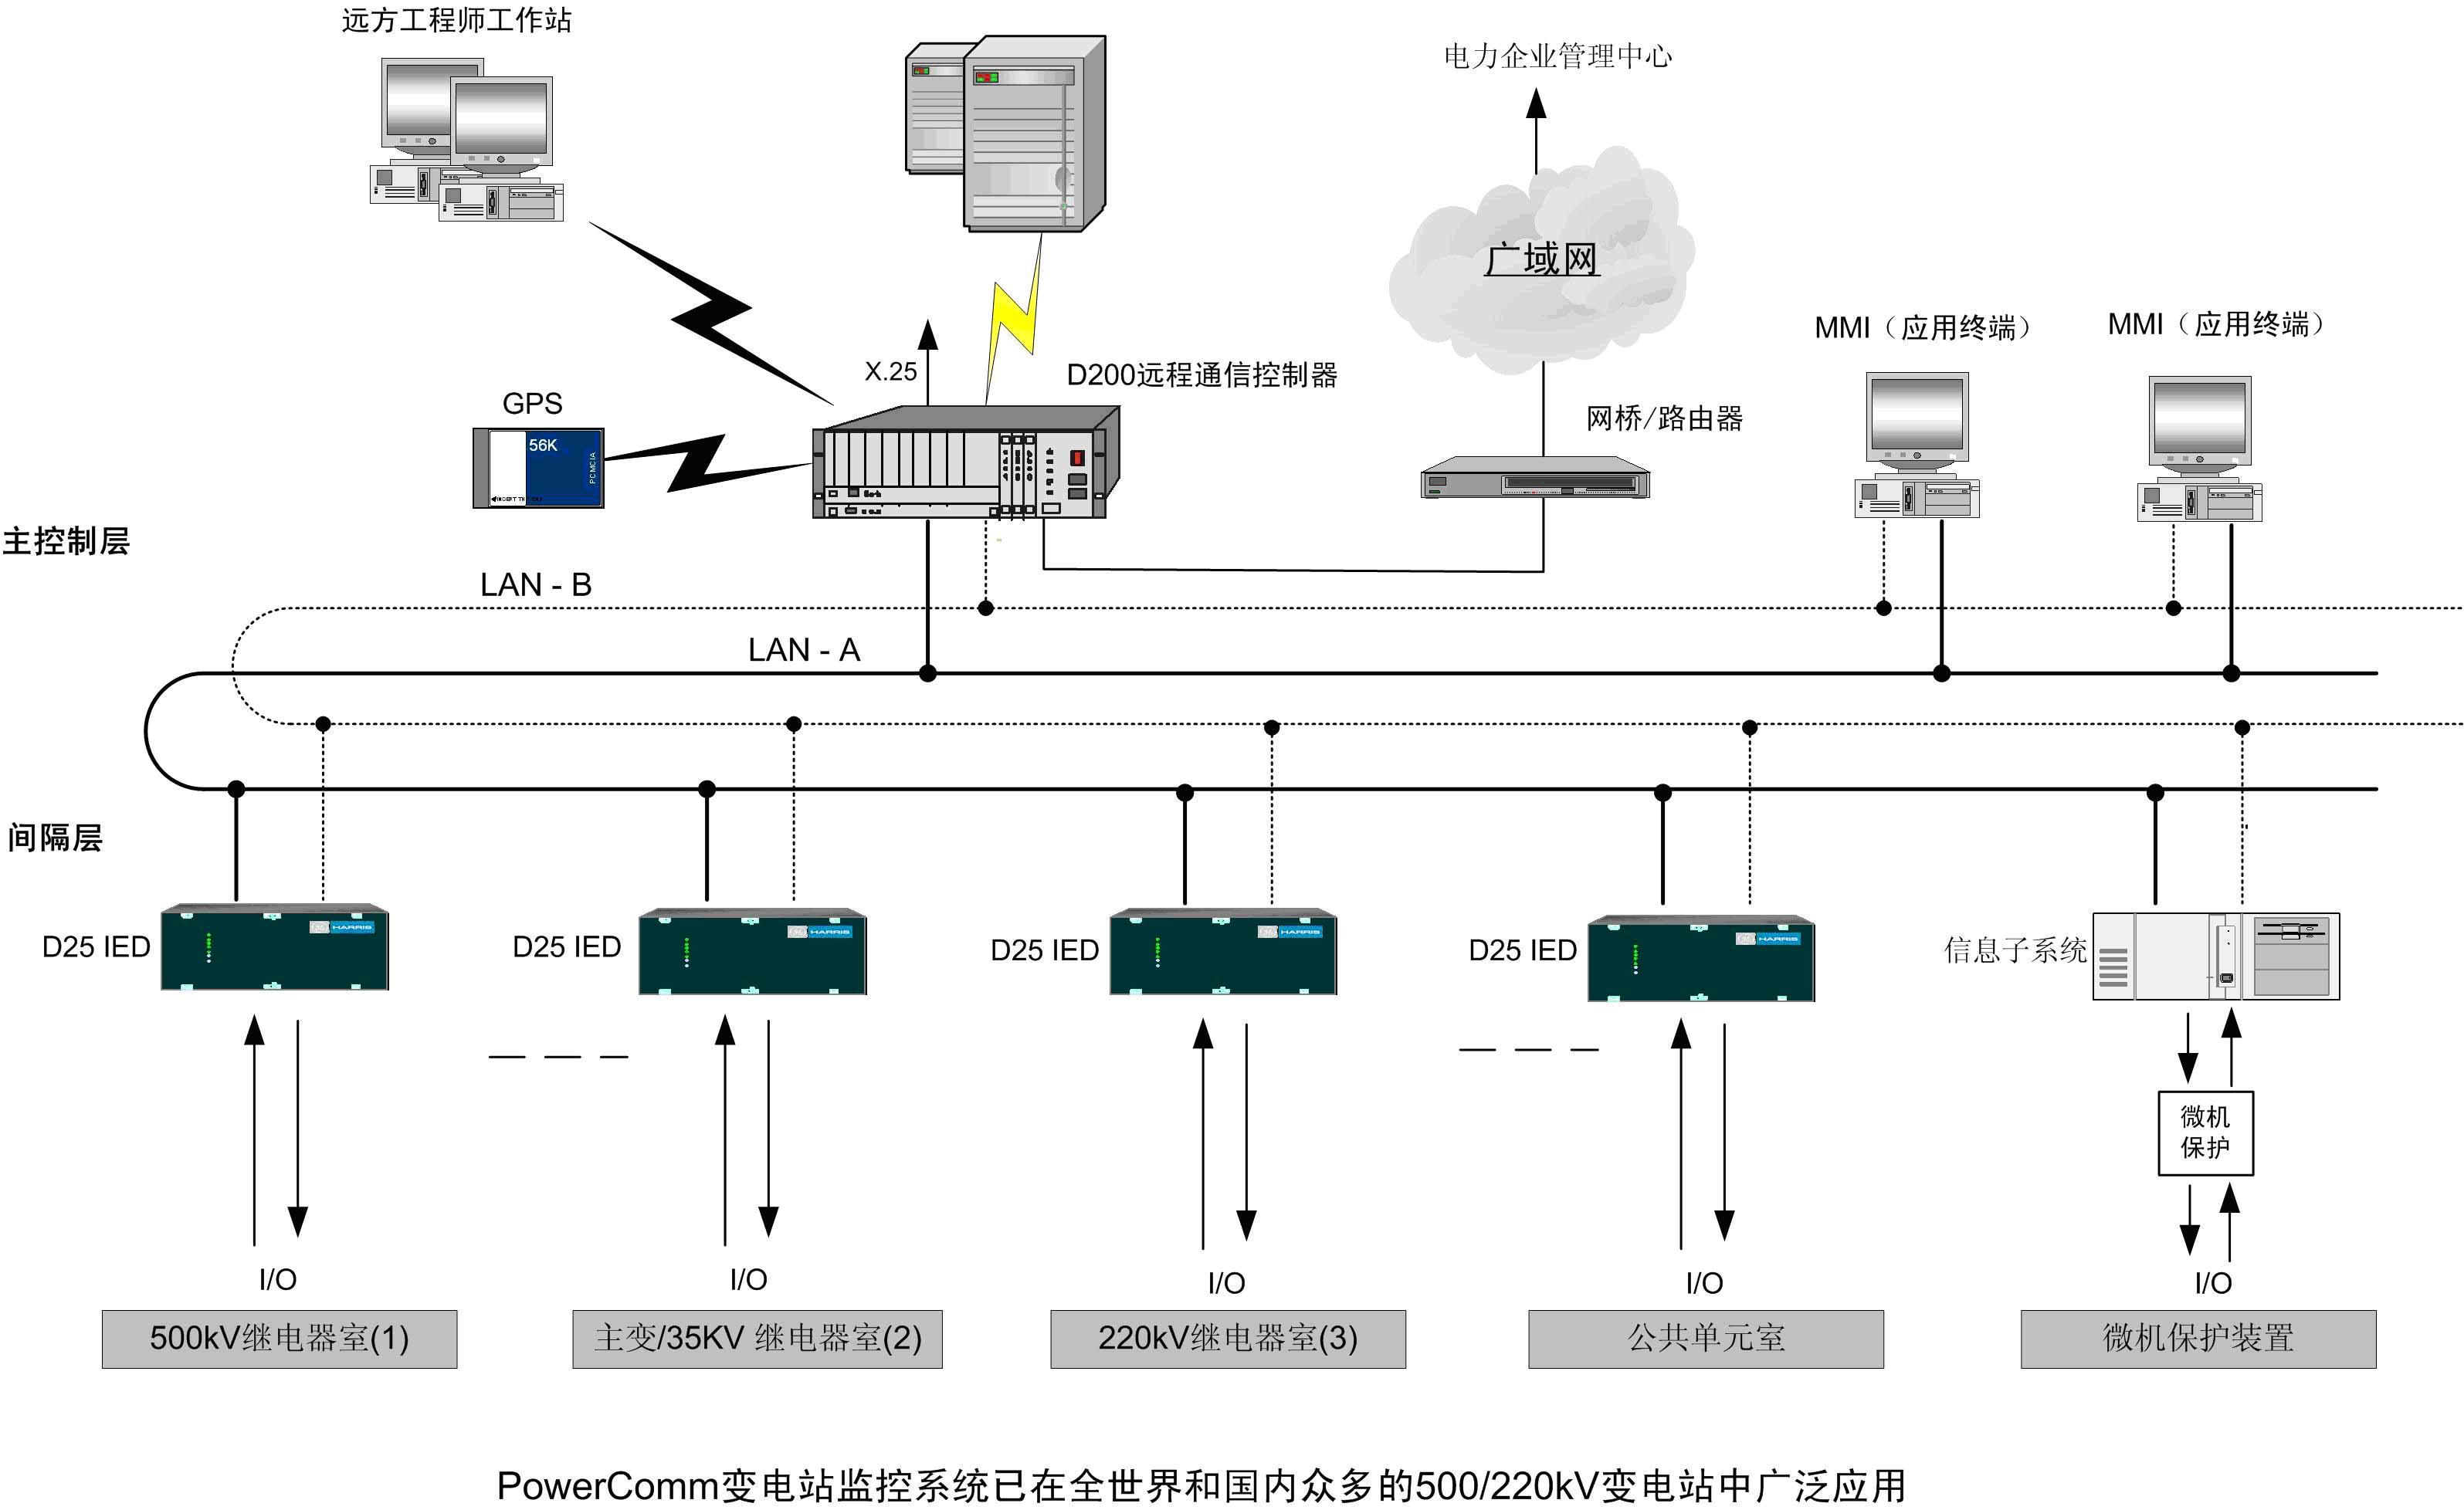 PowerComm 2000变电站监控系统(500/220kV)